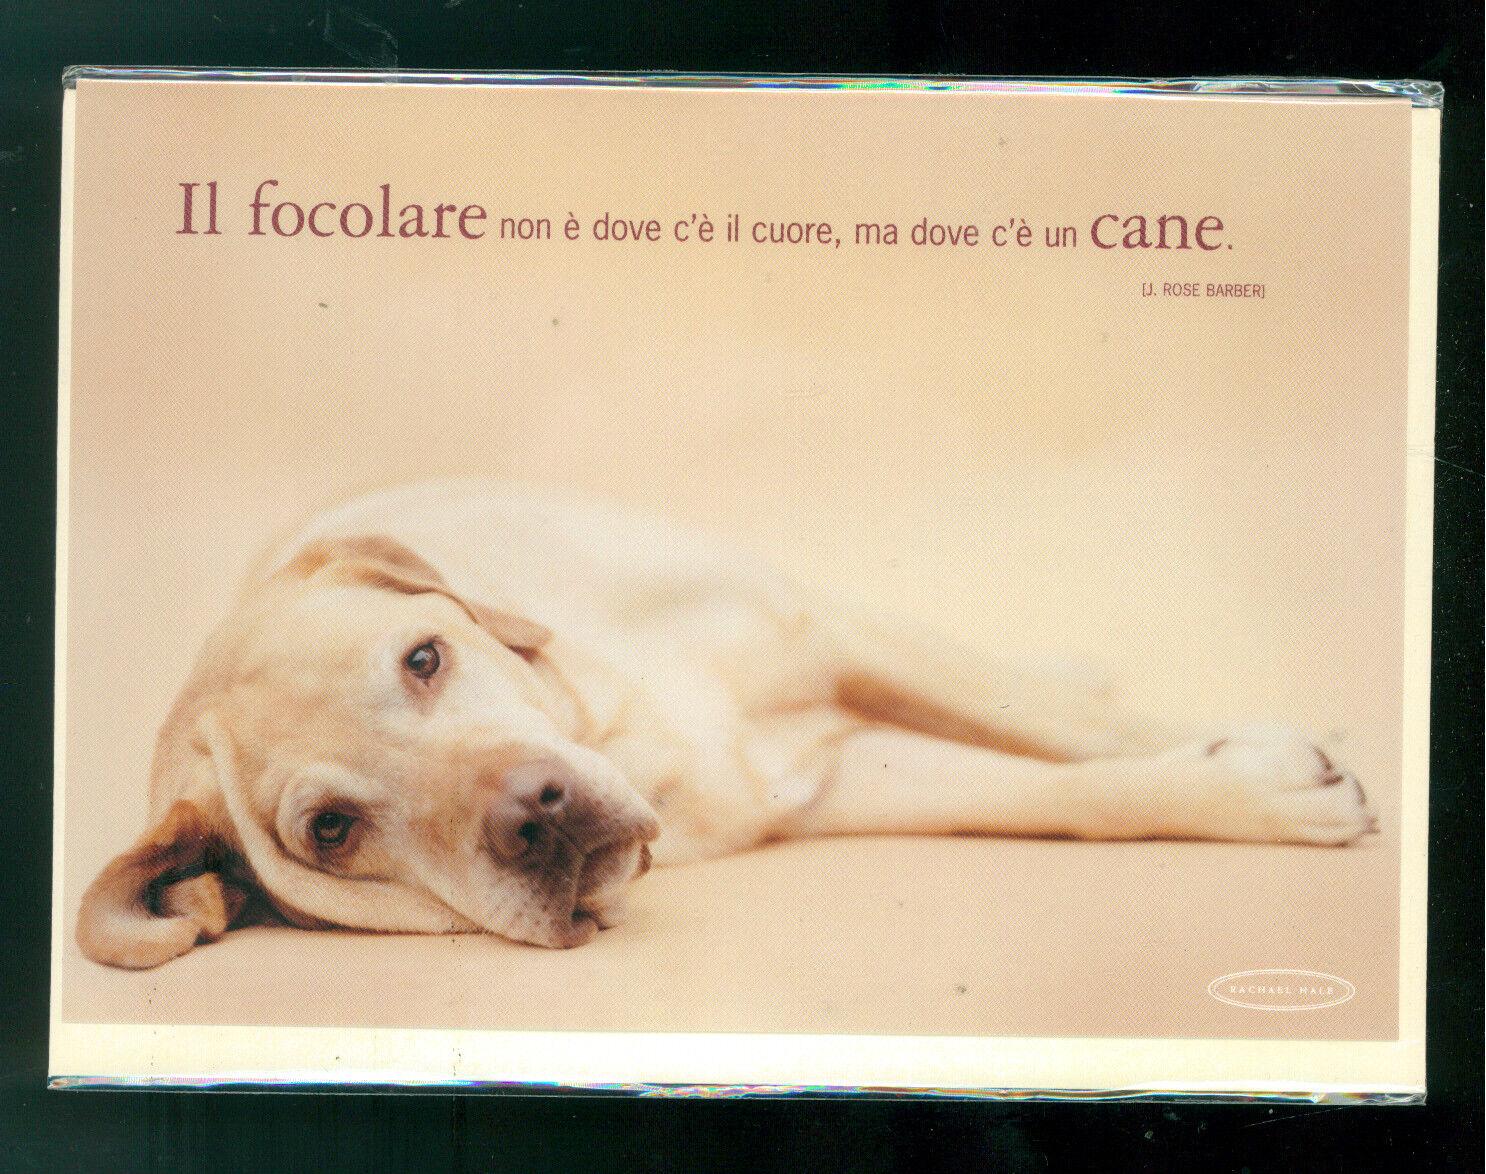 RACHAEL HALE BIGLIETTO AUGURI GIFT CARD MEDIO CANE DOG 2004 SPENCE